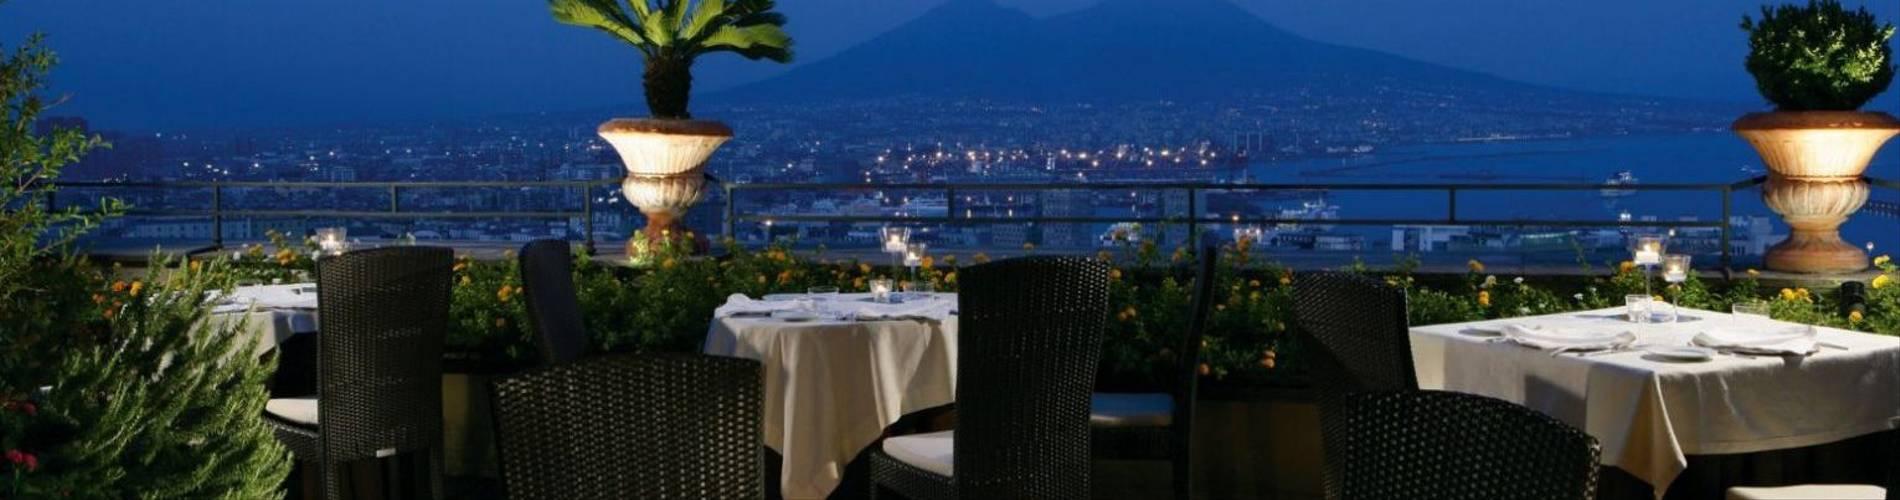 San Francesco Al Monte, Naples, Italy (21).JPG